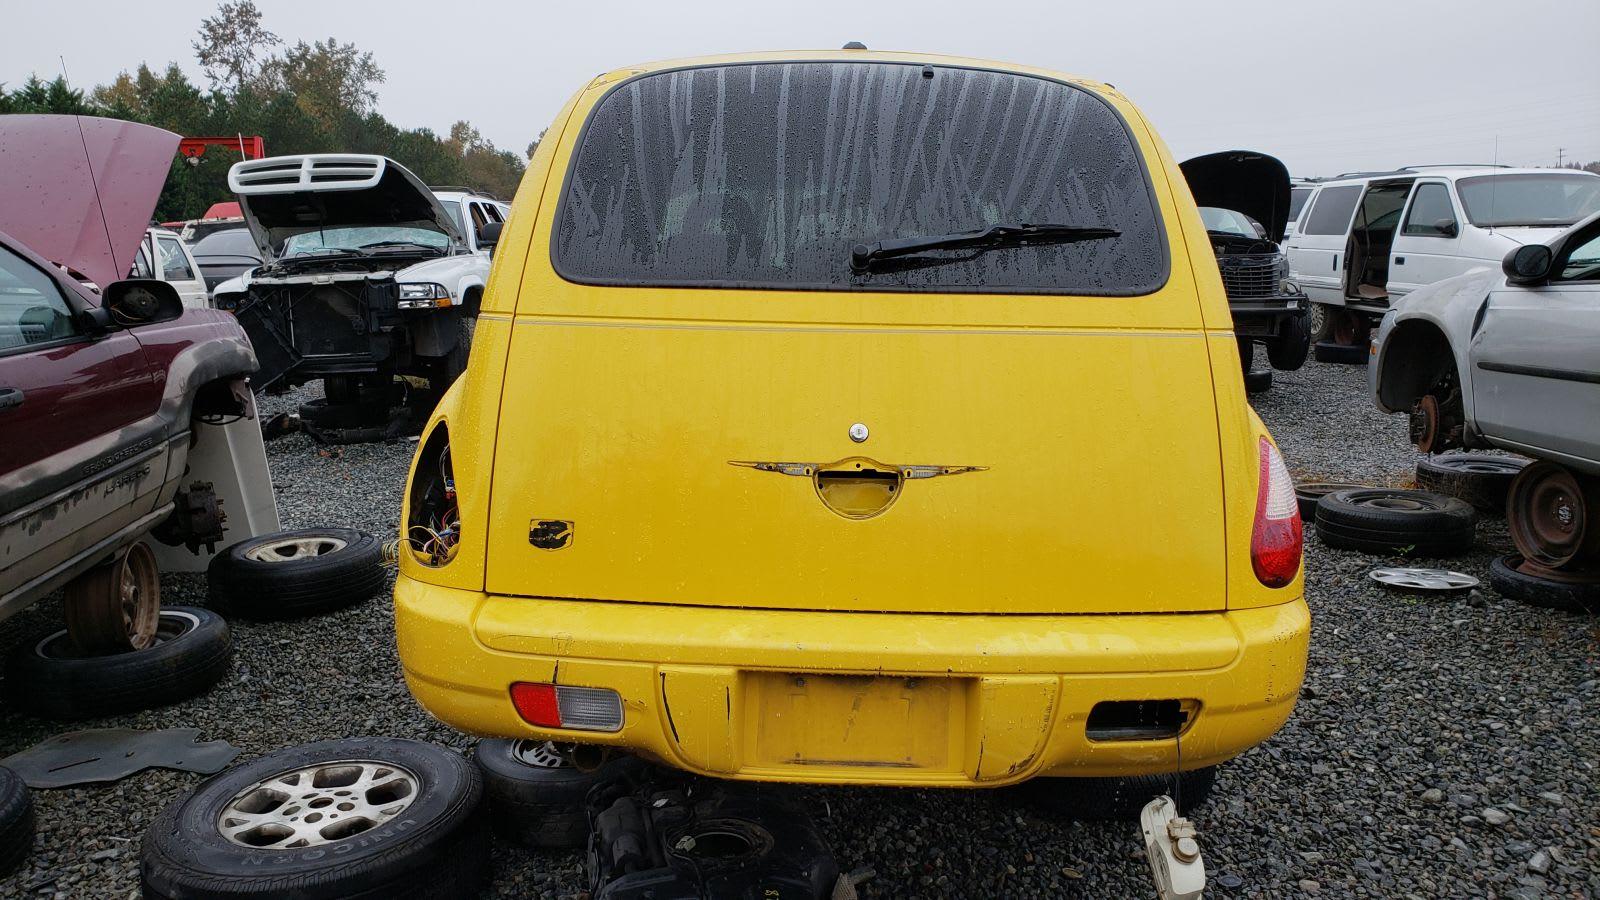 2006 Chrysler PT Cruiser Route 66 Edition | Junkyard Gem